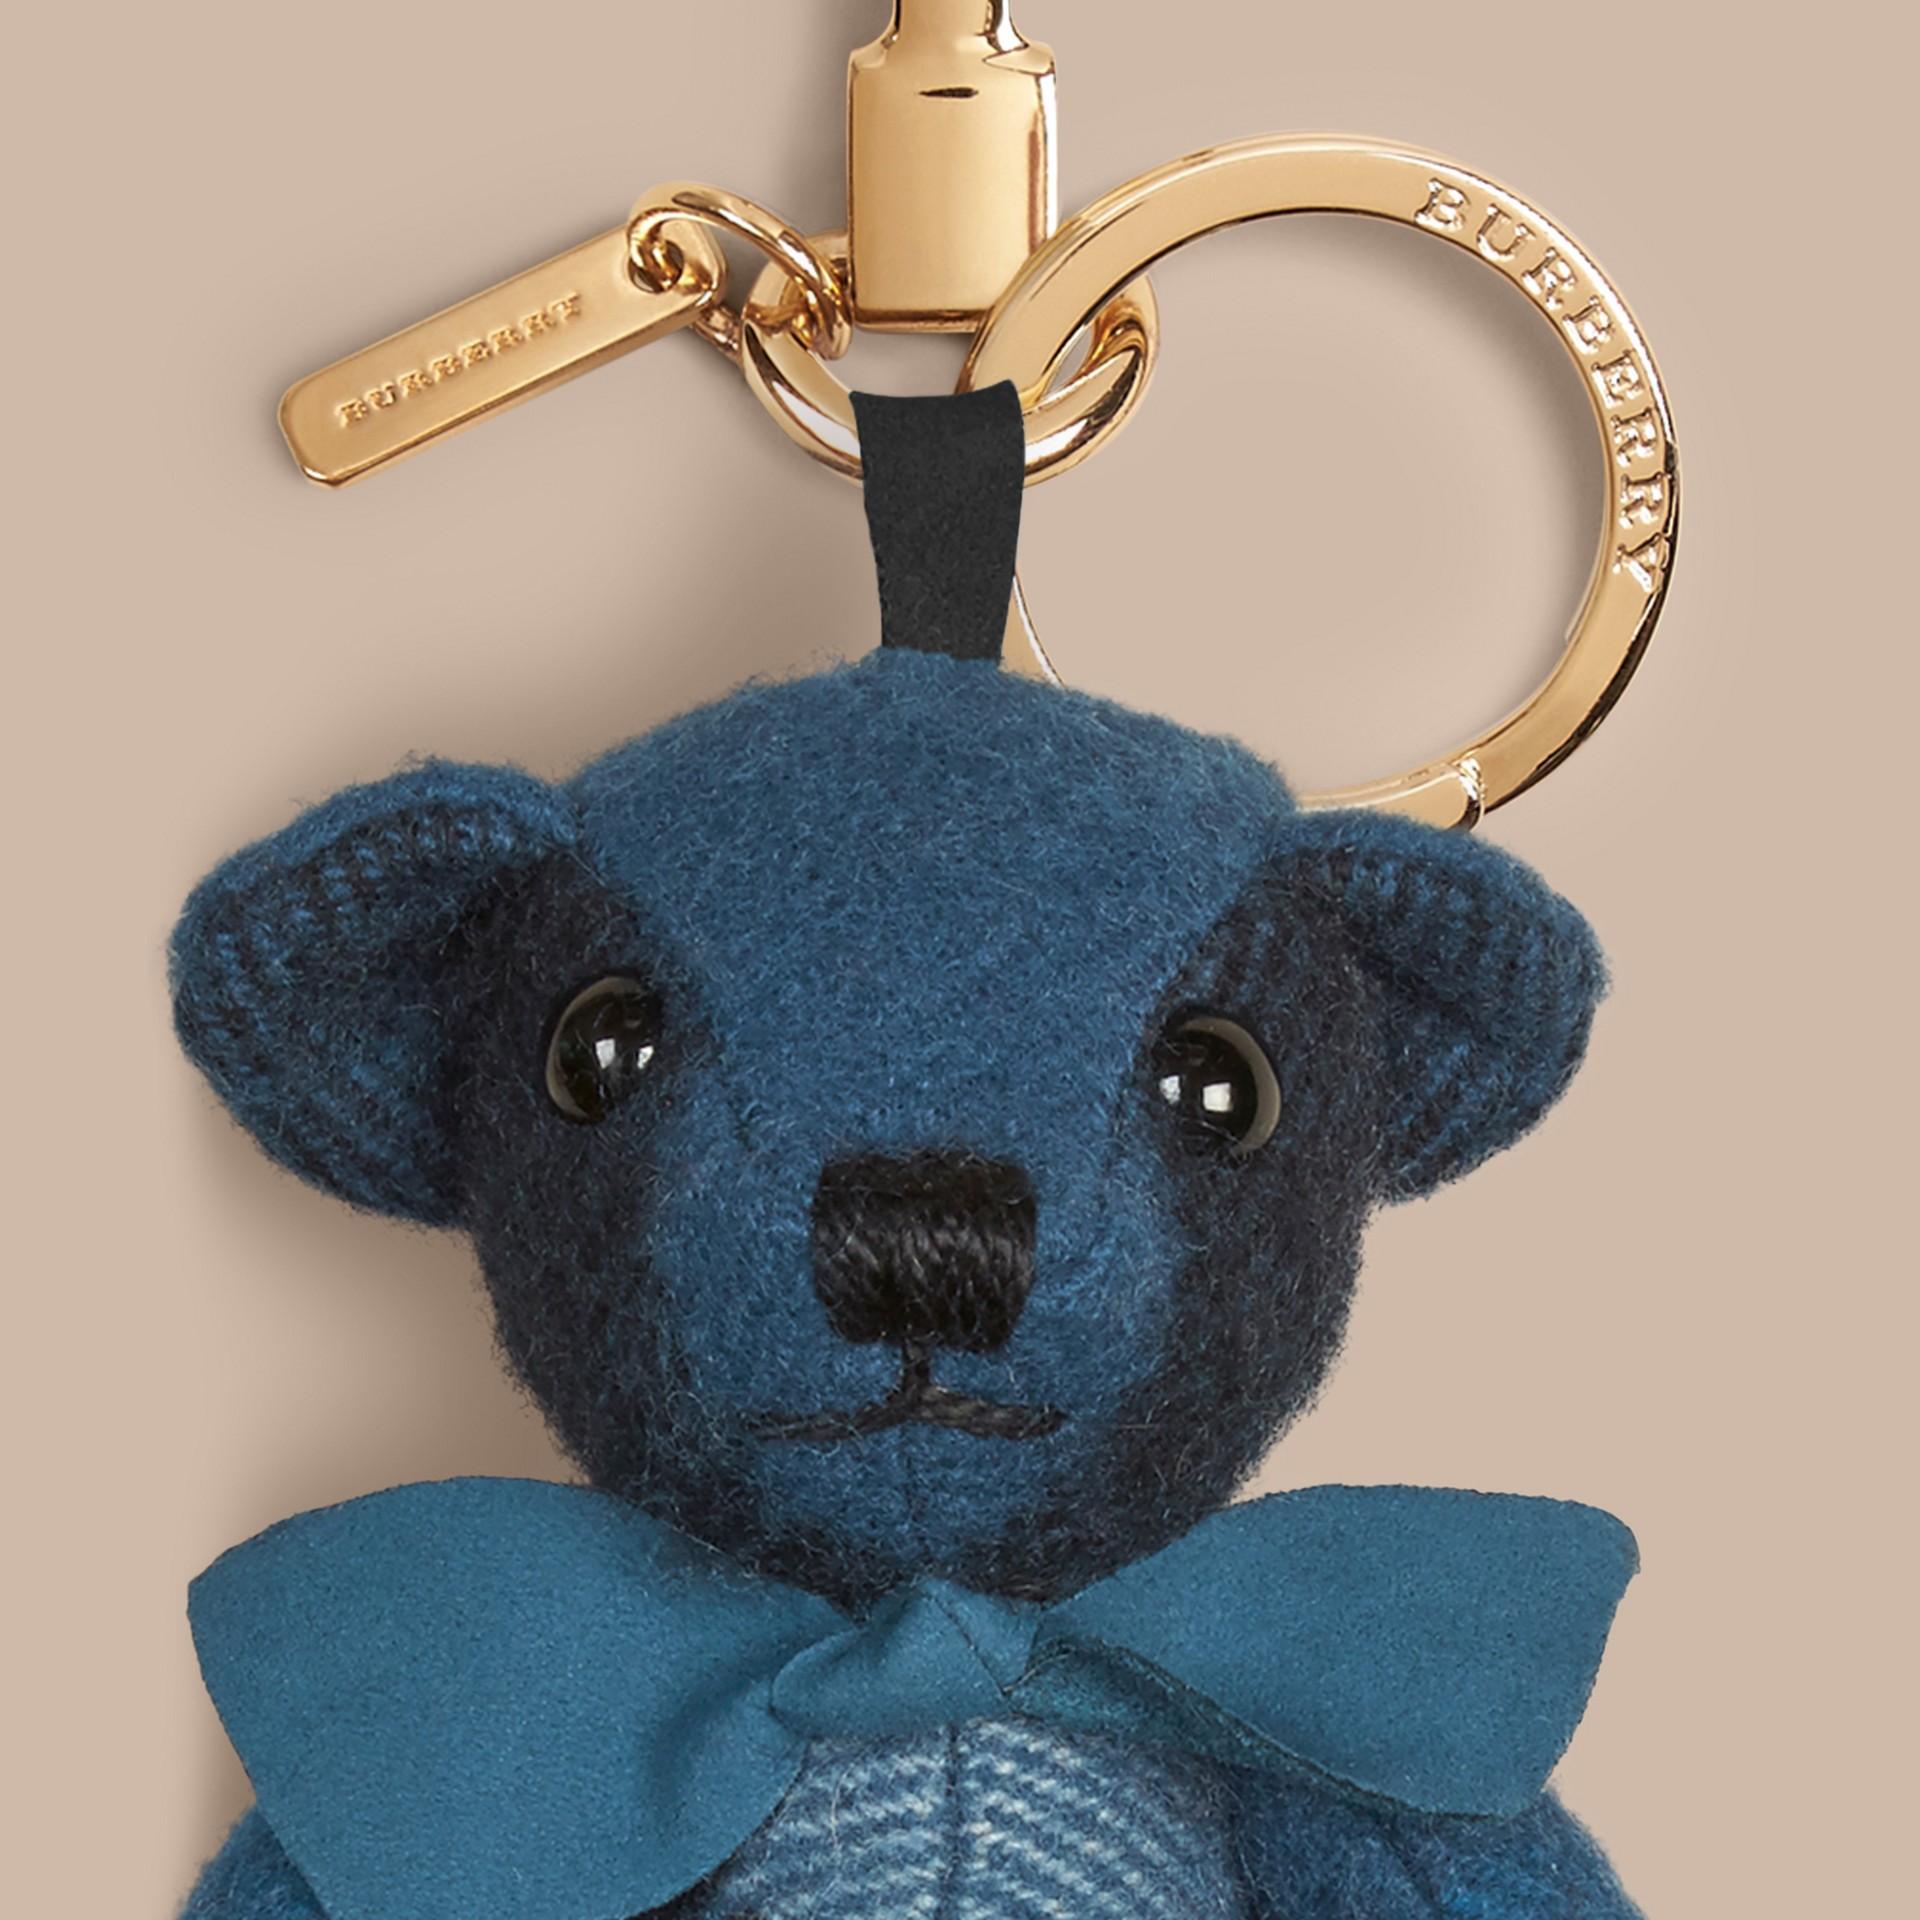 Teddybär-Anhänger aus Kaschmir mit Karomuster Dunkles Aquamarin - Galerie-Bild 2